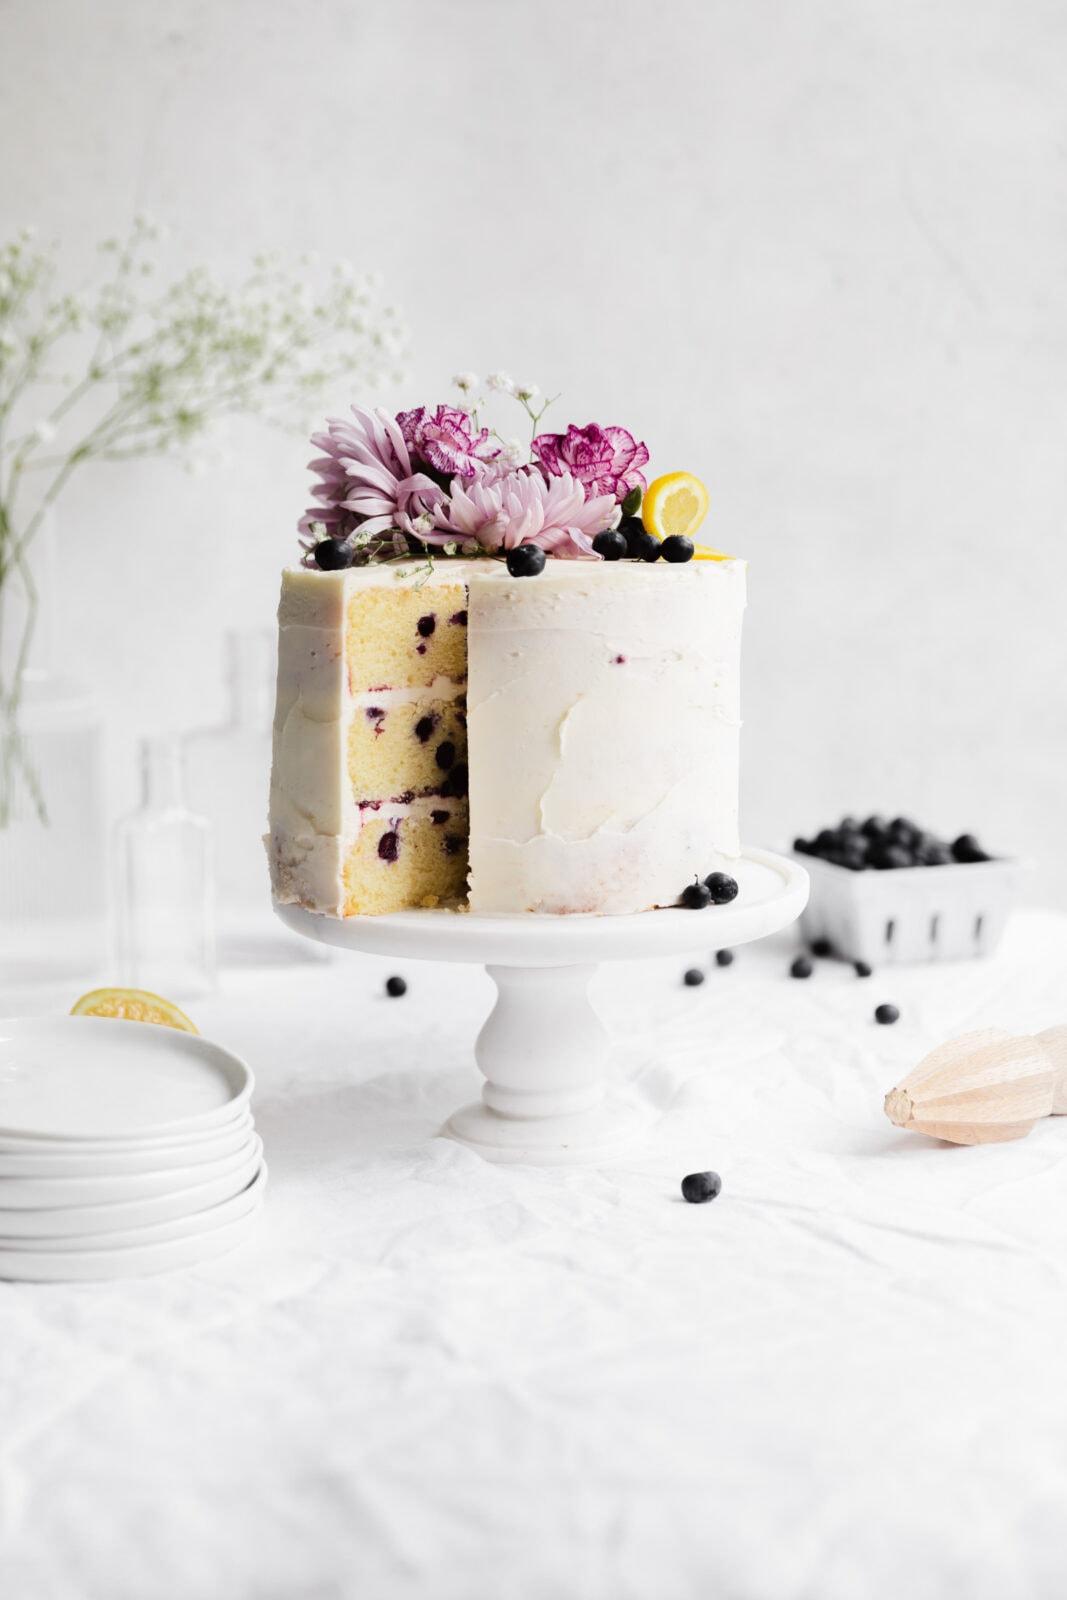 lemon blueberry cake on a cake stand